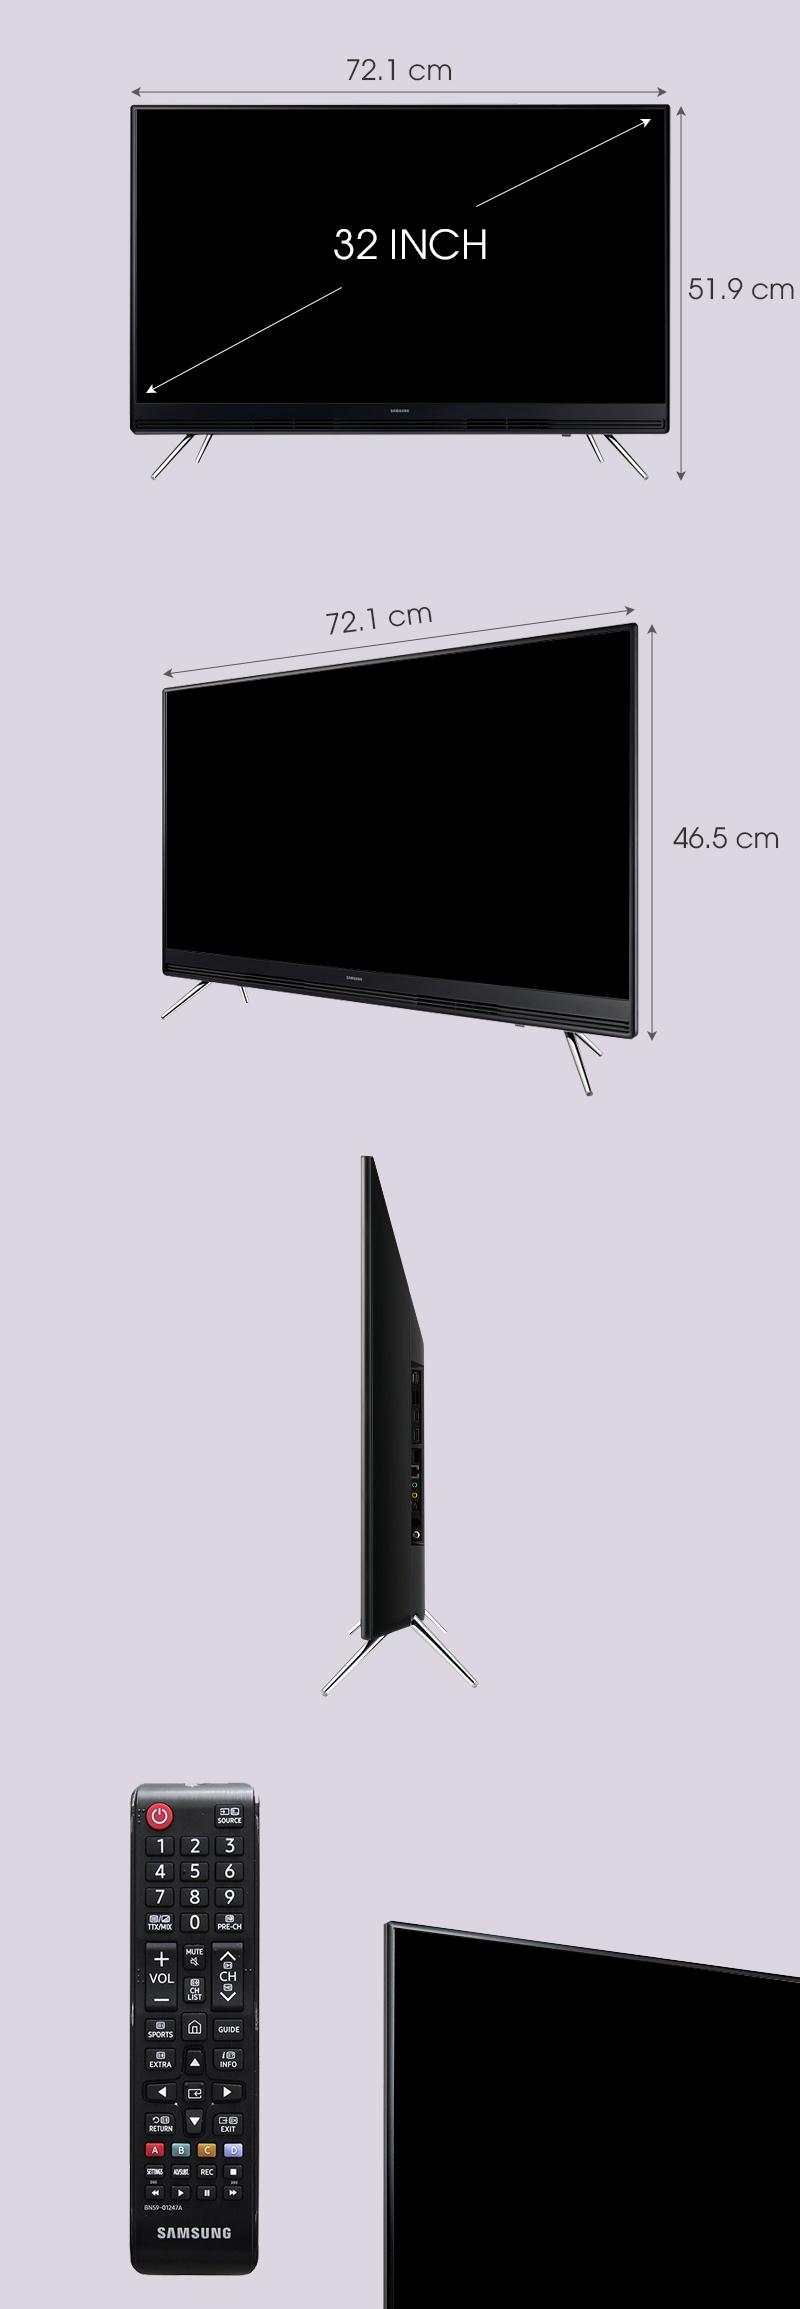 Smart Tivi Samsung 32 inch UA32K5300 - Kích thước TV